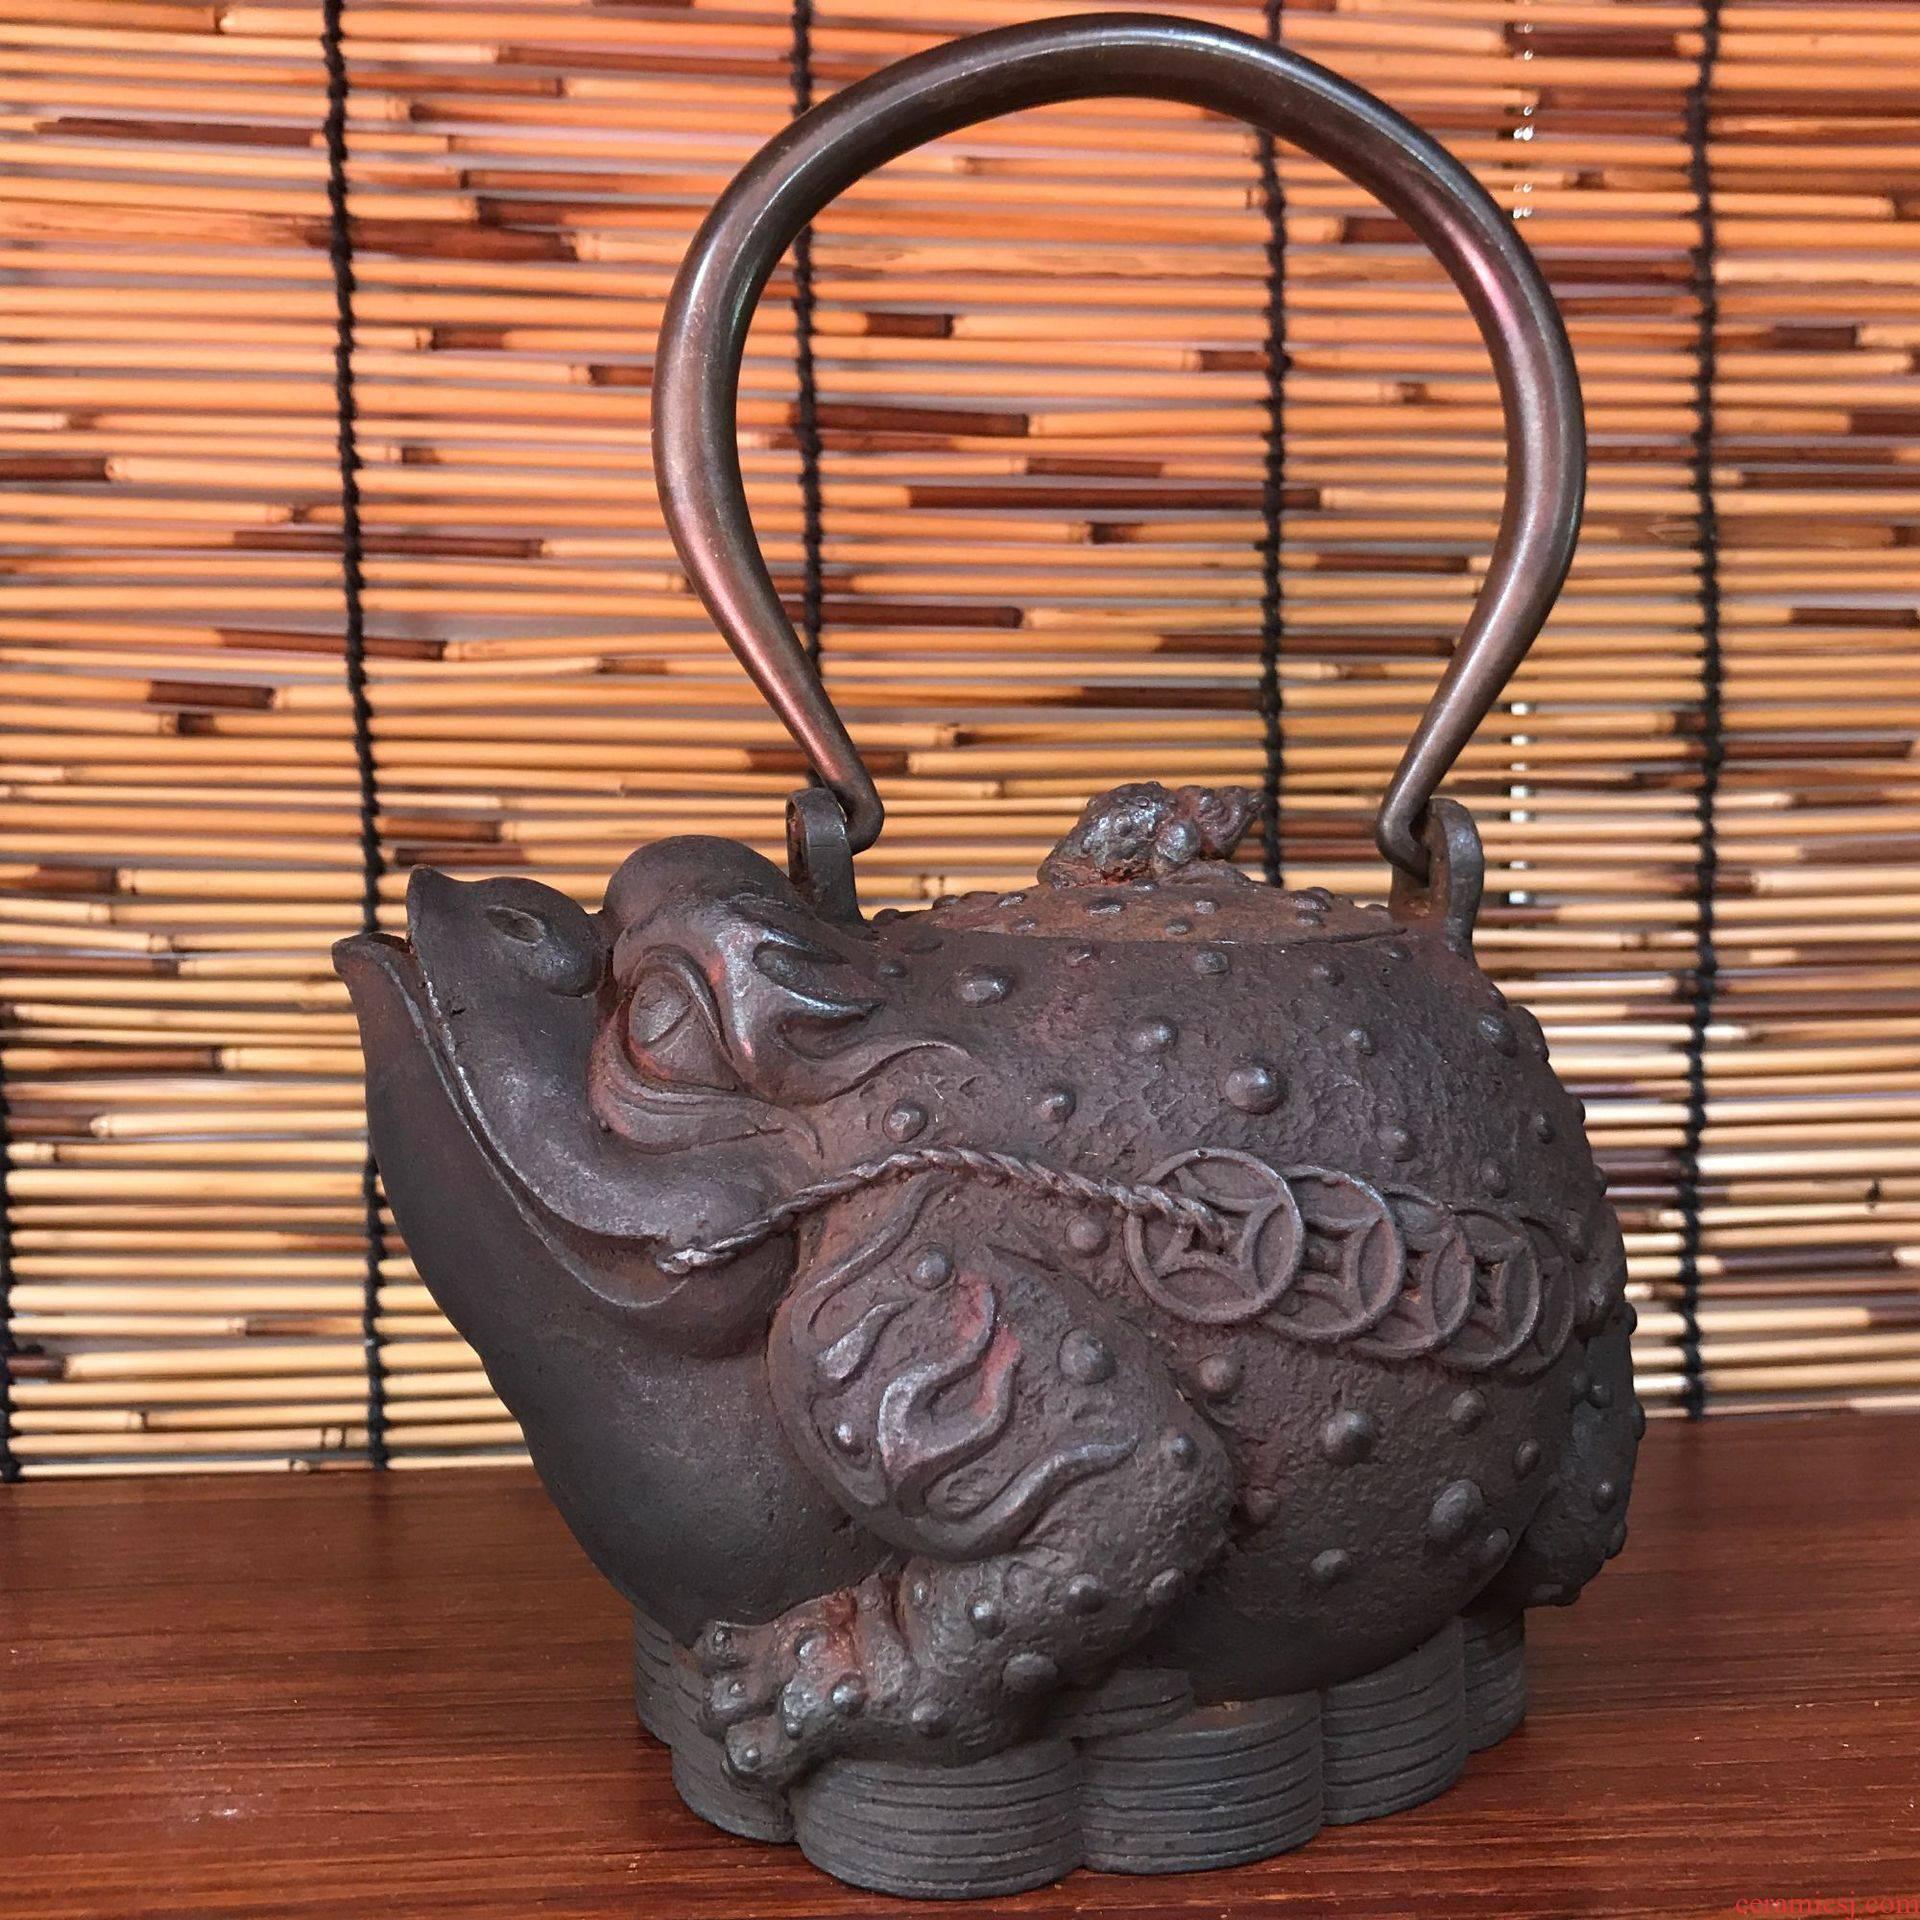 Xia Jietie pot manufacturer spittor brother pot of checking iron pot of cast iron teapot in southern Japan iron pot